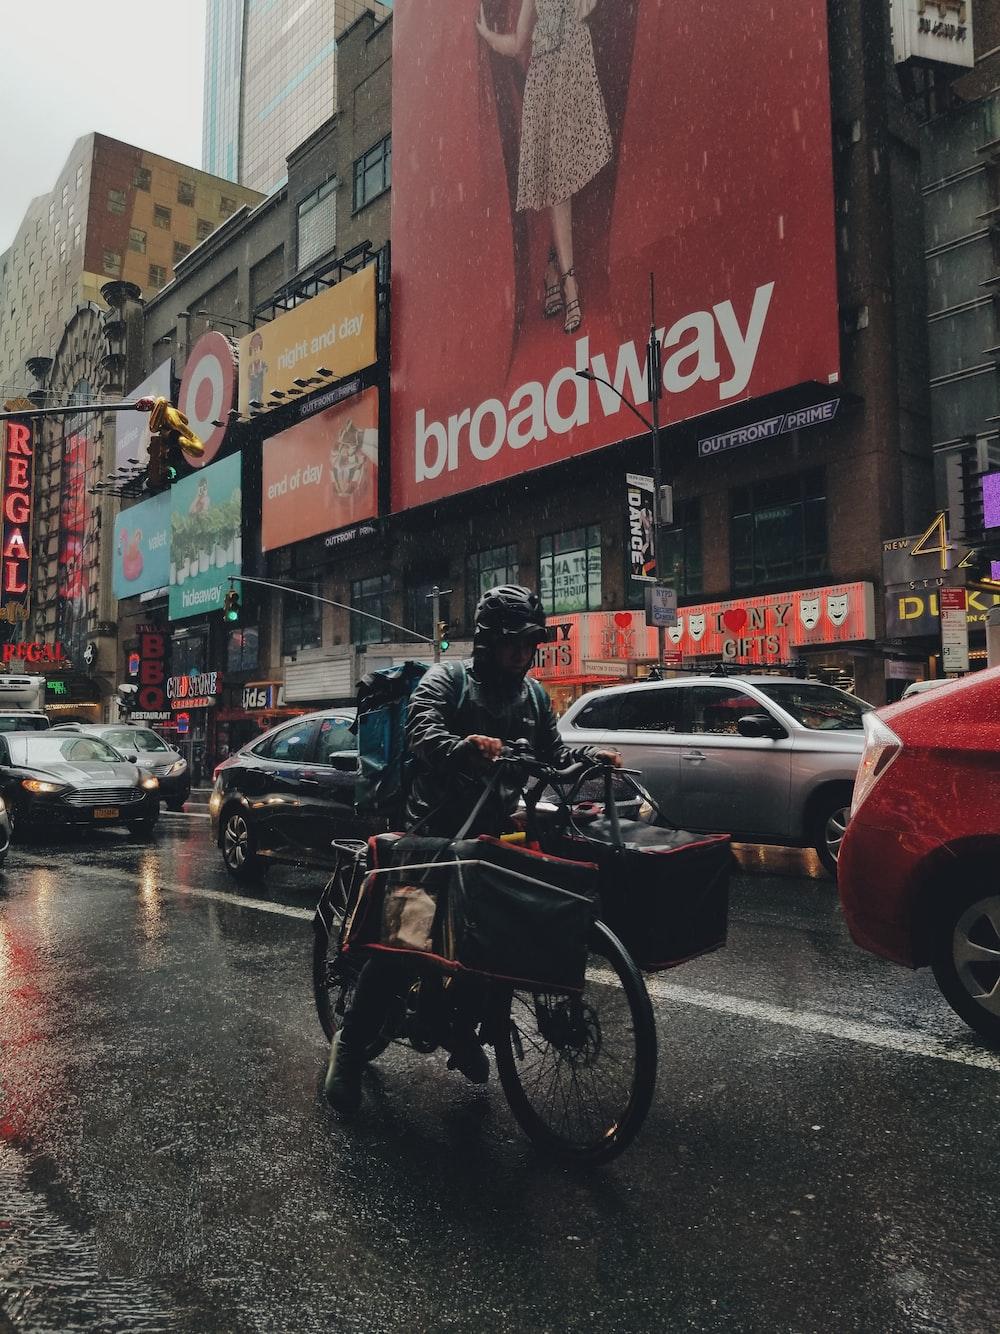 man riding bicycle in road during daytime